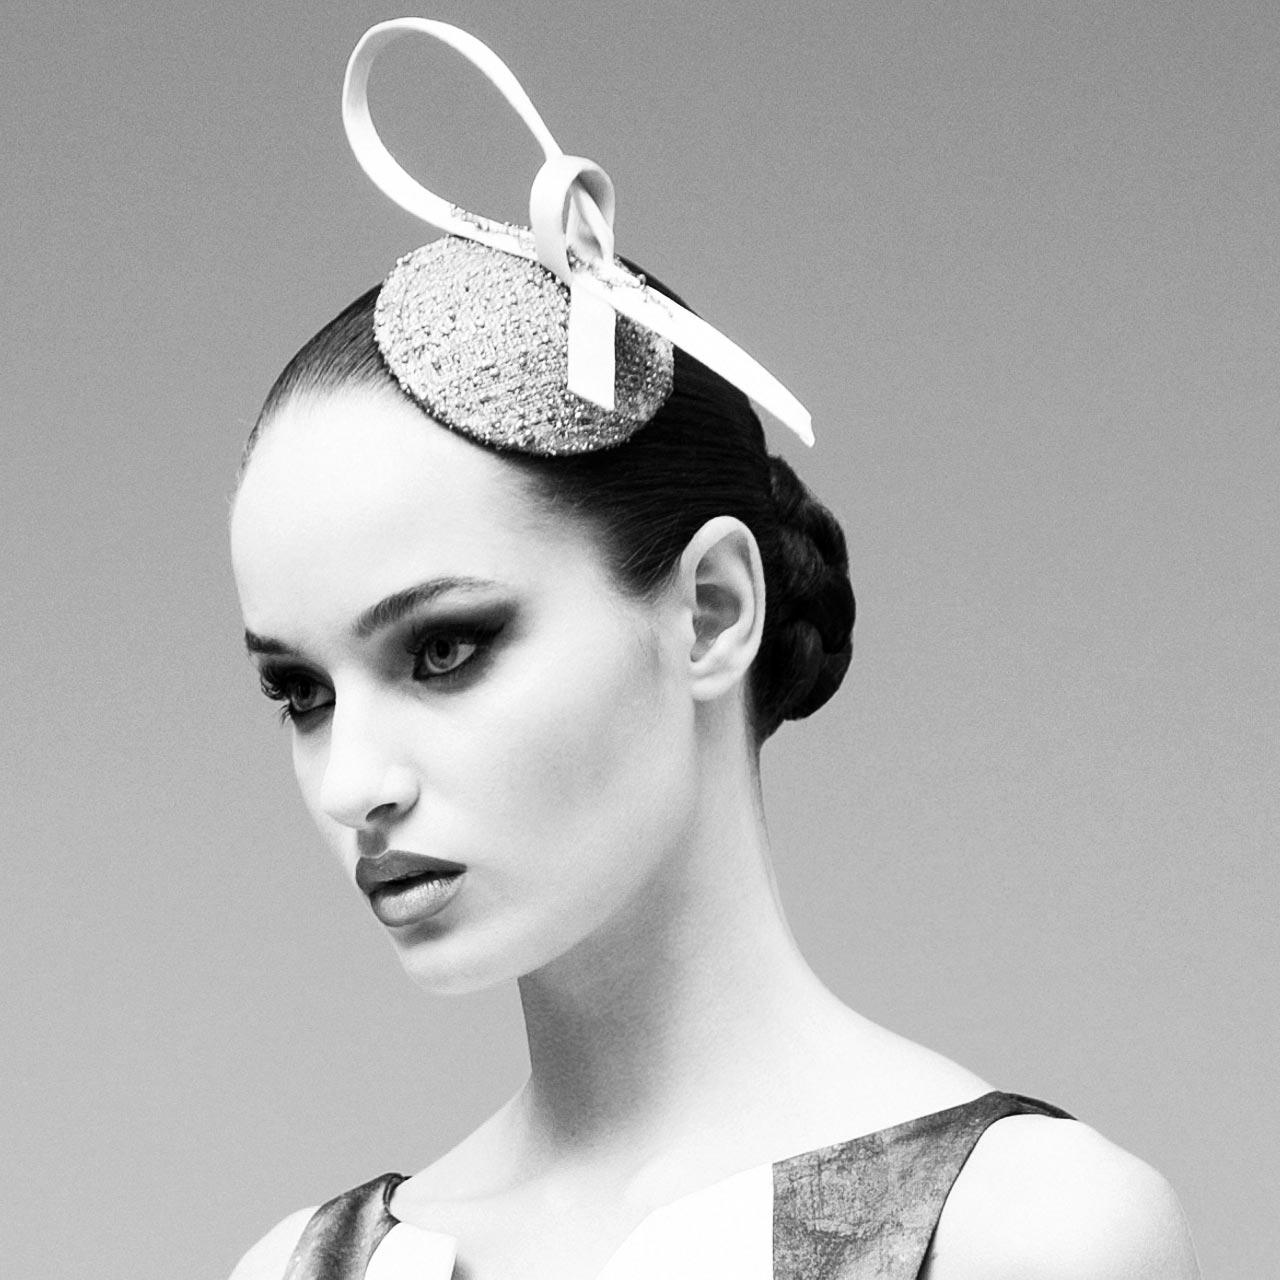 Monvieve Clotilde Headpiece Collection